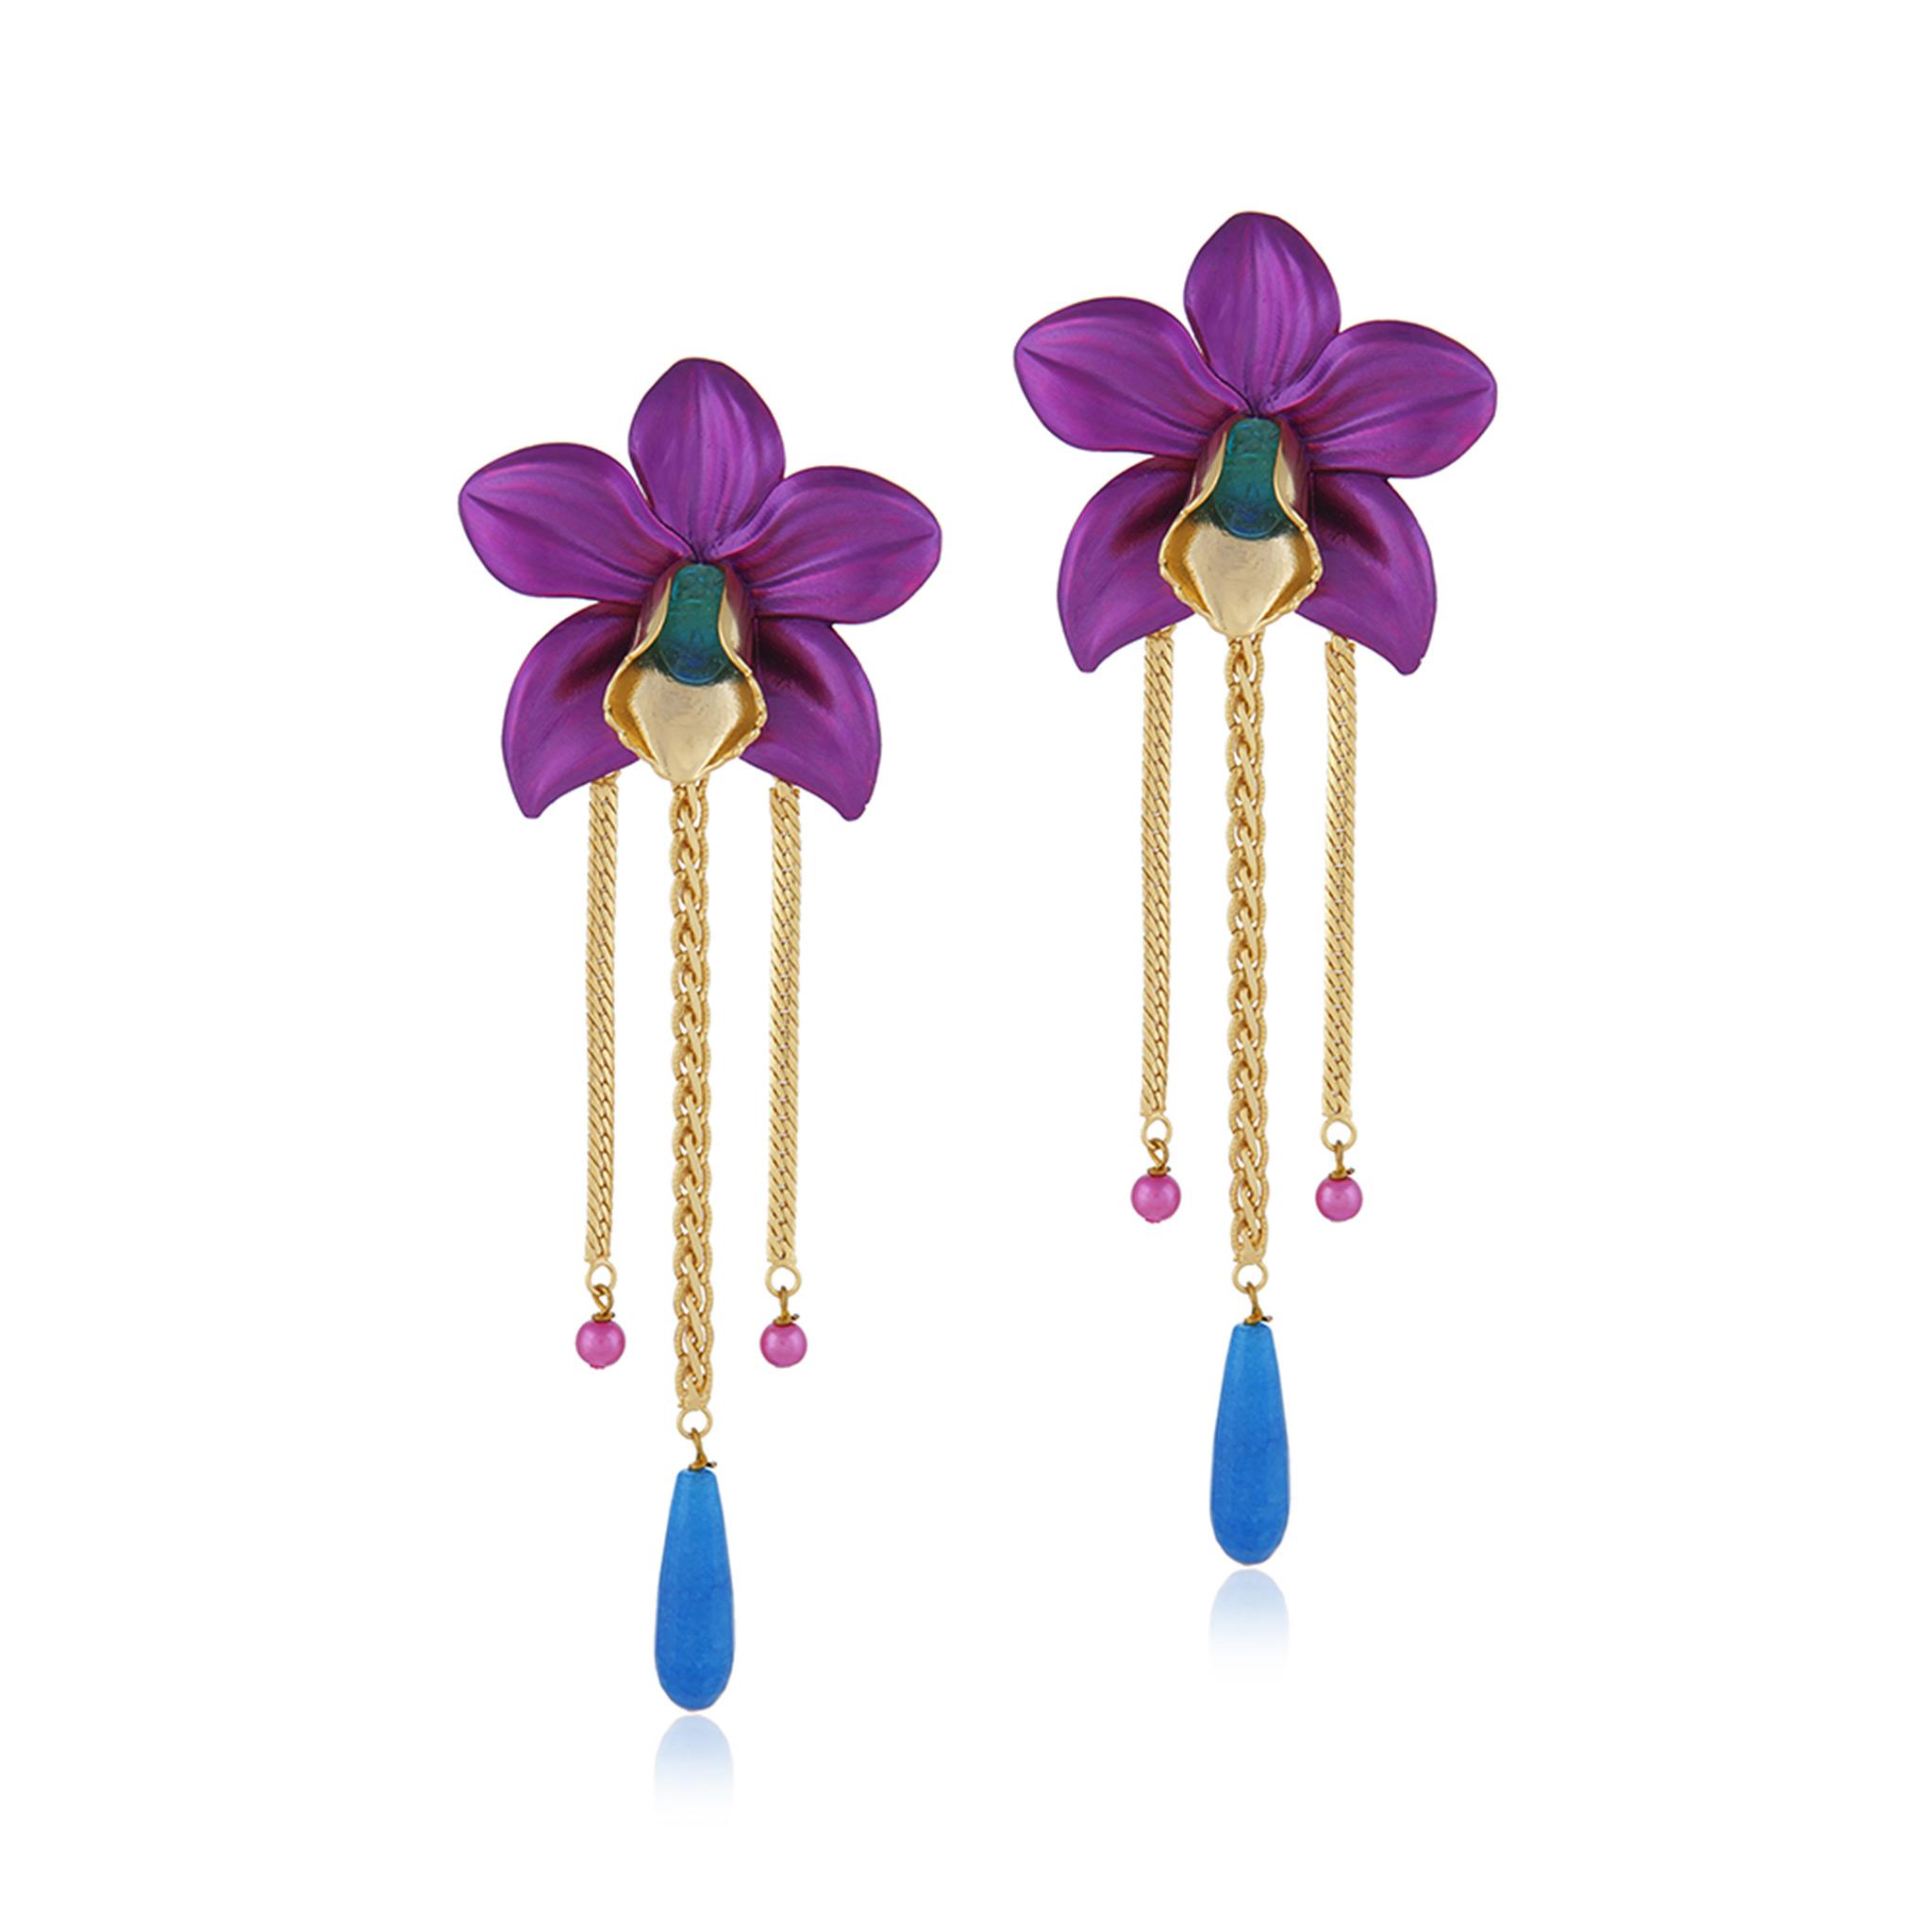 Valliyan Nitya Arora Gold Plated Wild Orchid Earrings Purple